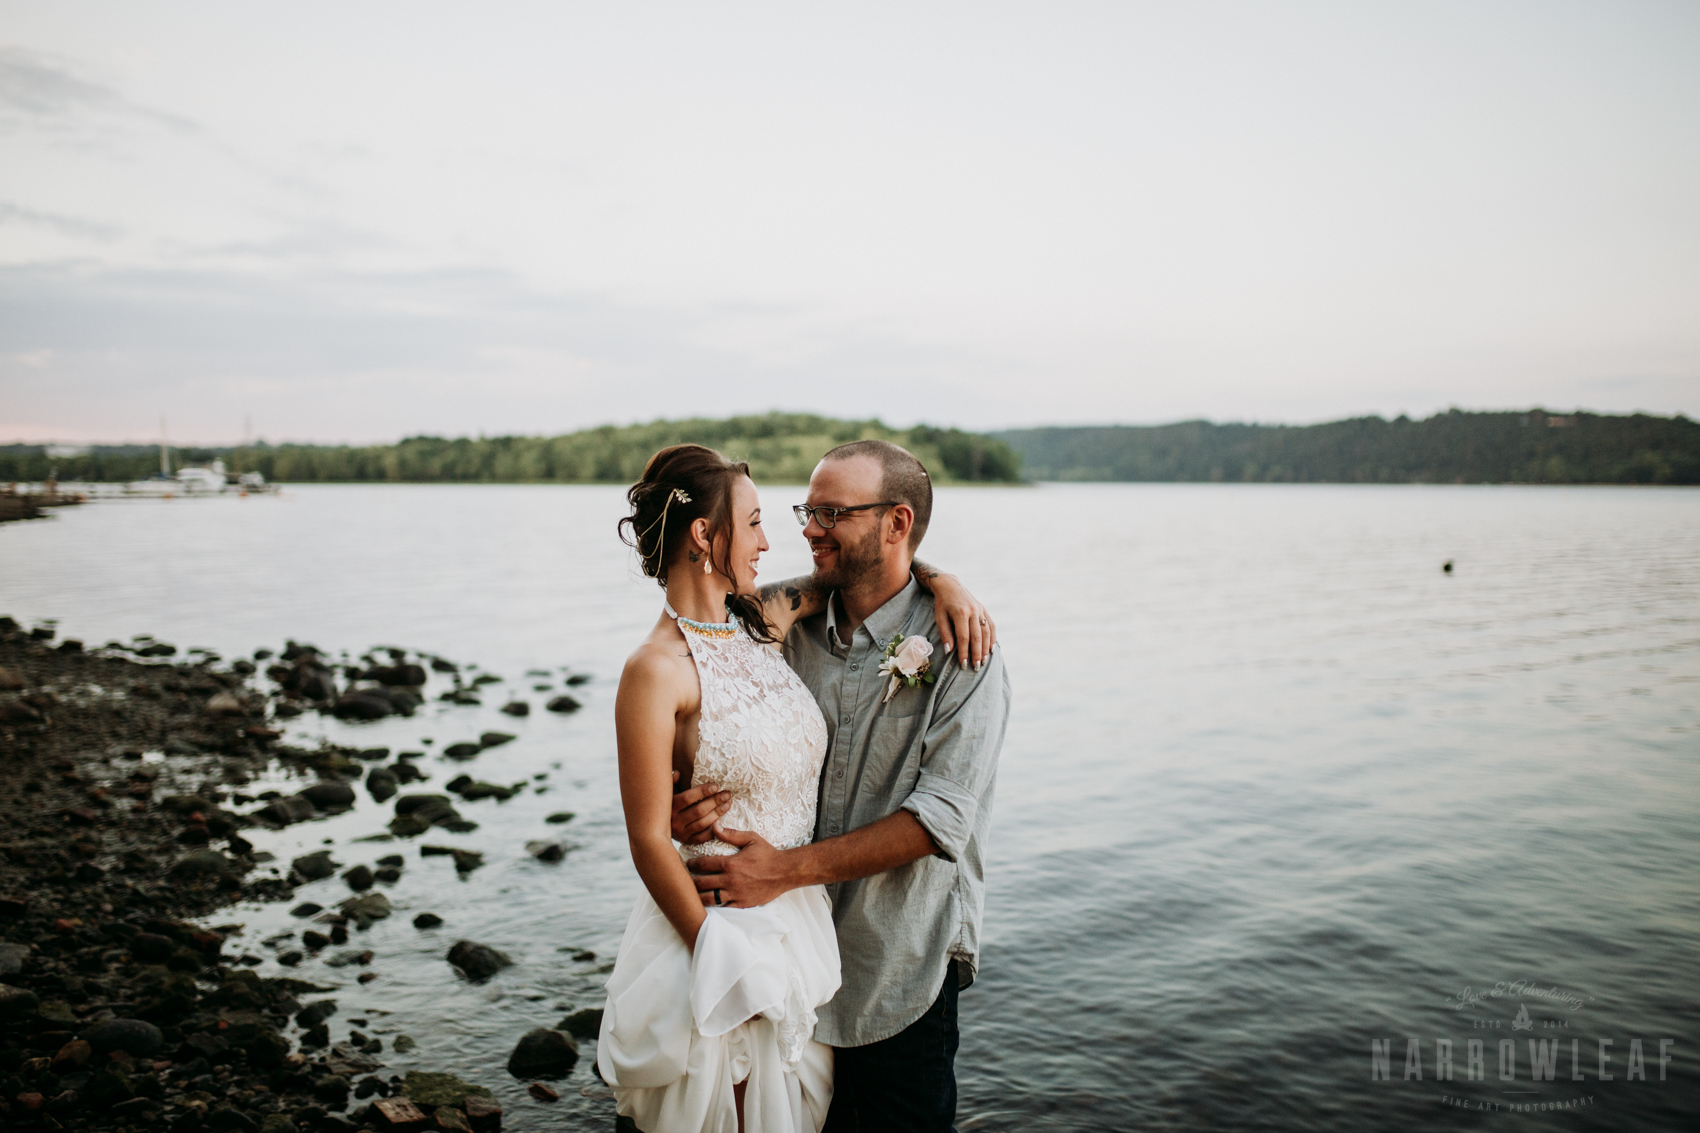 minnesota-outdoor-wedding-elopement-NarrowLeaf_Love_&_Adventure_Photography-34.jpg